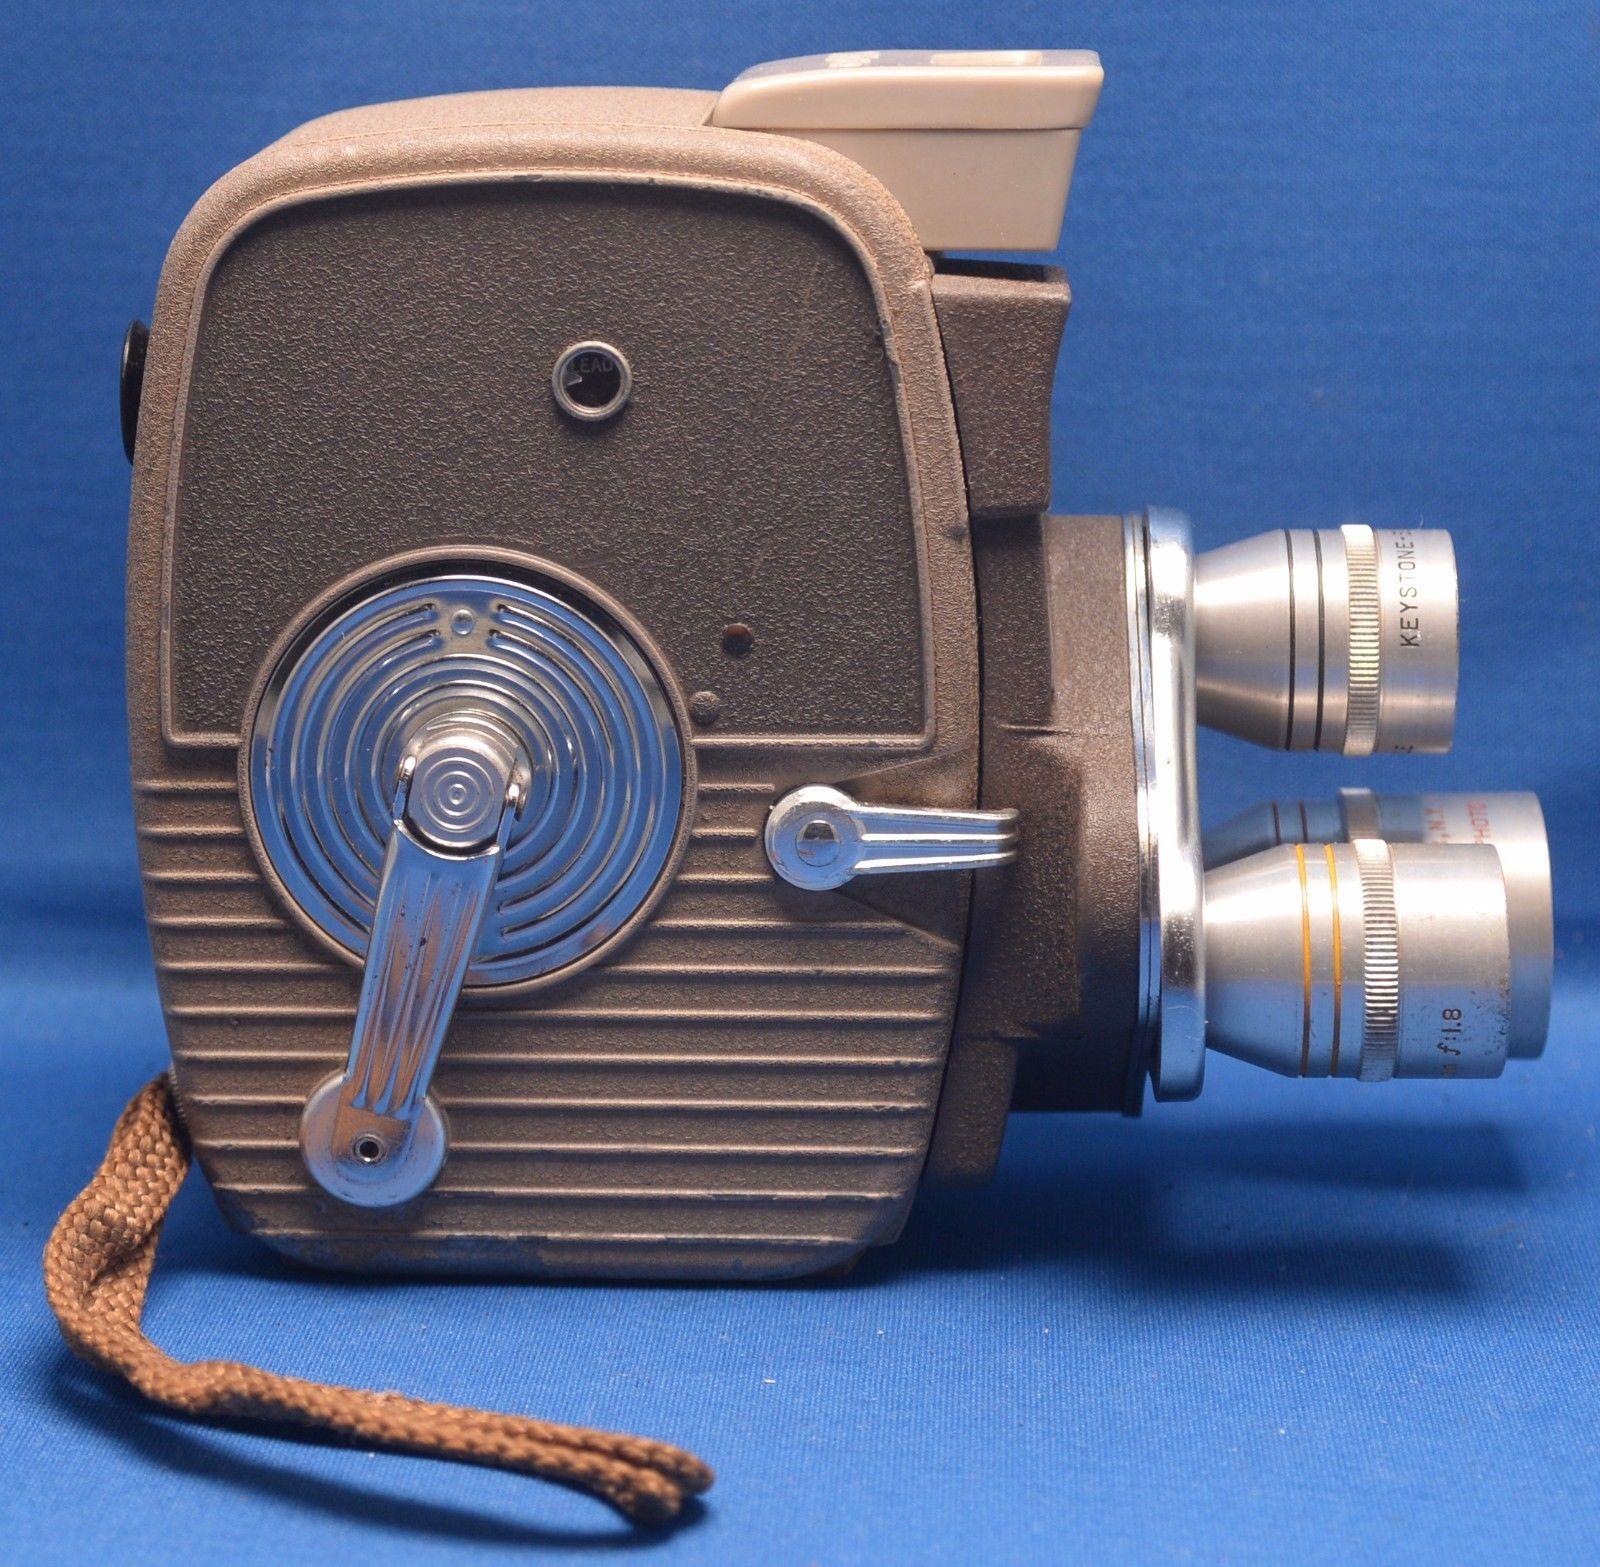 Keystone K-26 Vintage 8mm Magazine Movie and 50 similar items